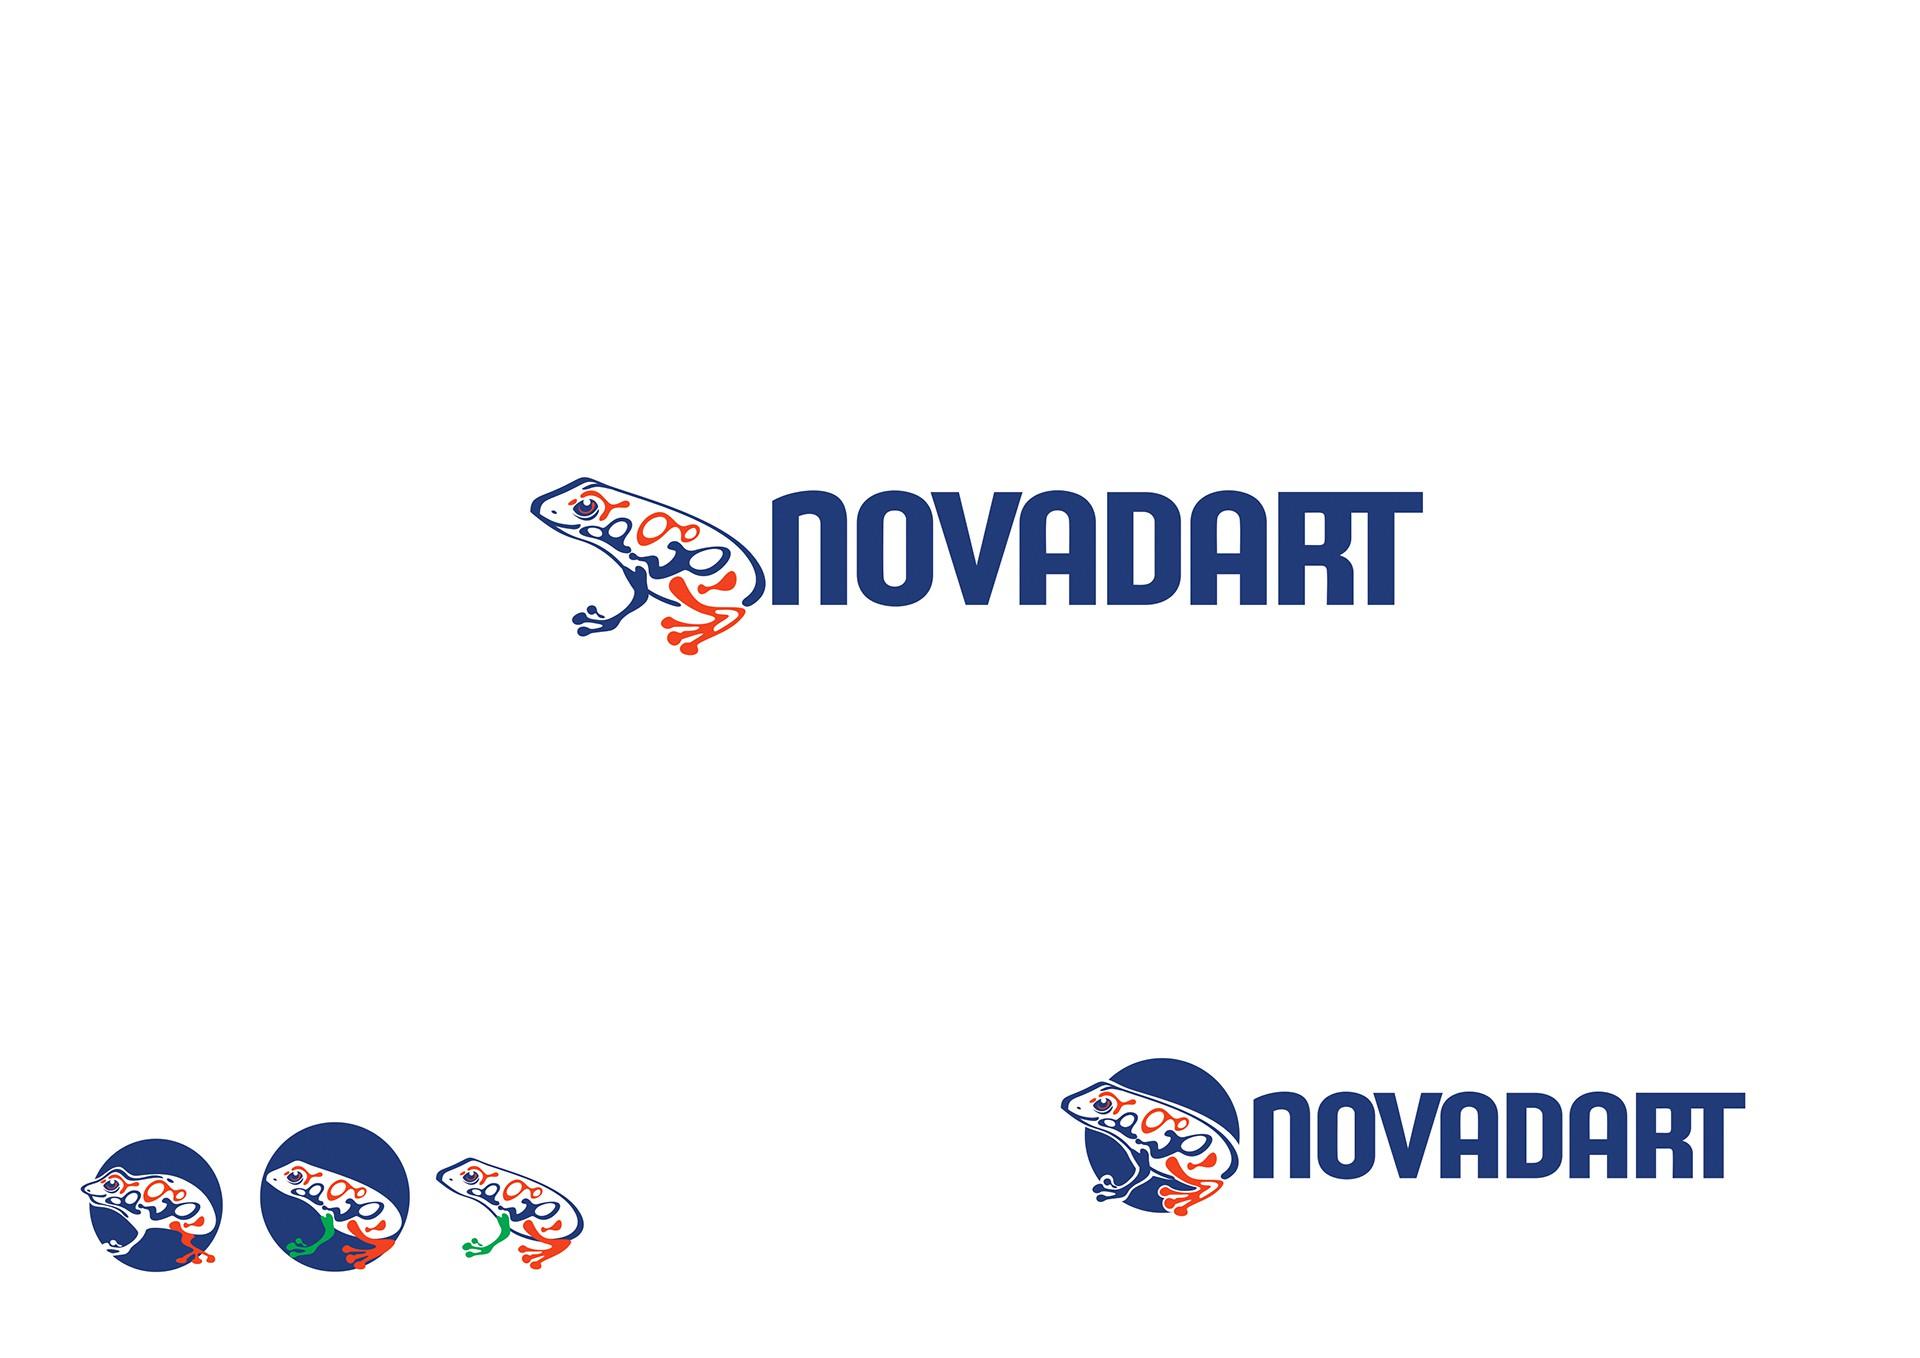 Create modern logo for the software development company Novadart